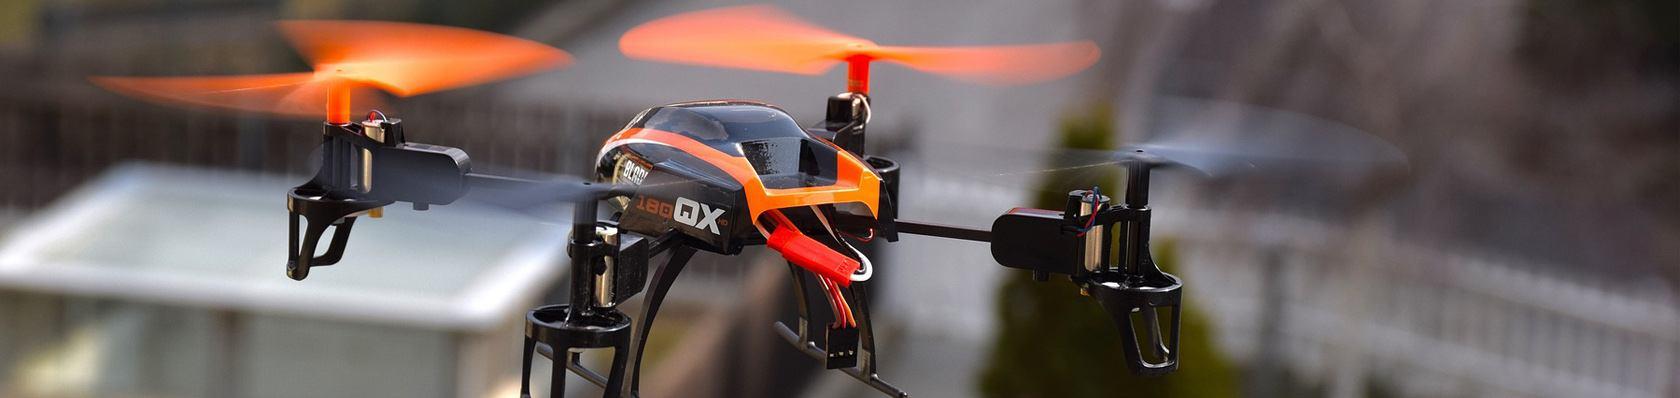 Quadrocopter im Test auf ExpertenTesten.de